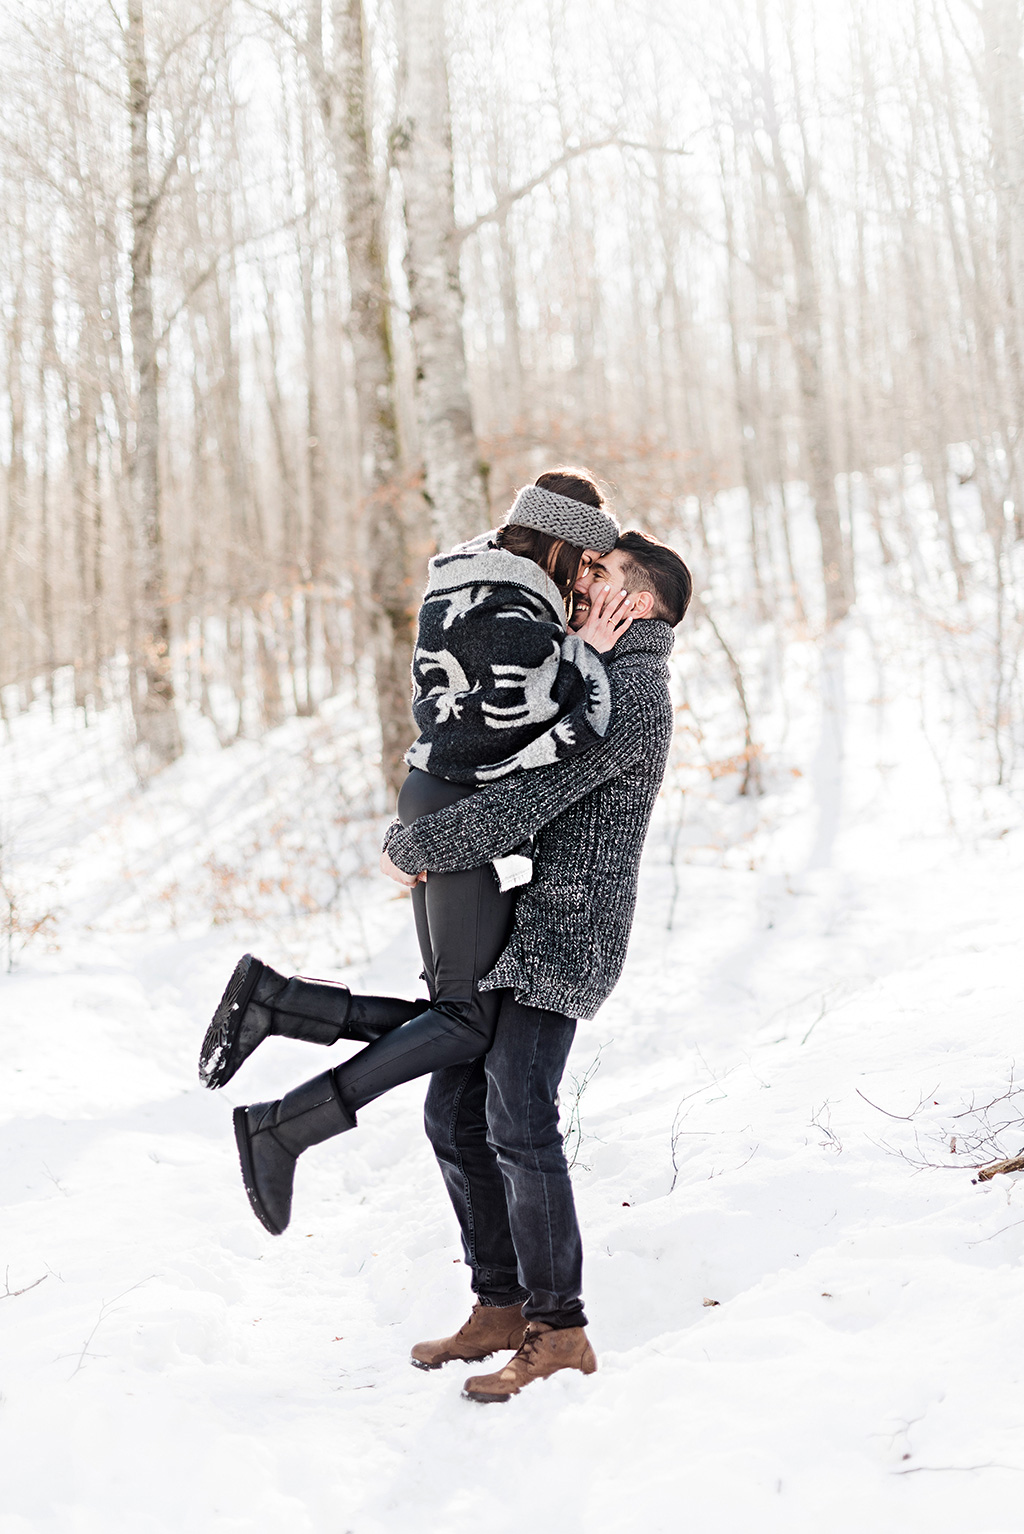 Alpine elopement photo session, Prewedding φωτογράφιση στα χιόνια, μια υπέροχη εμπειρία για το ζευγάρι, George Kostopoulos Fine Art Wedding Photography